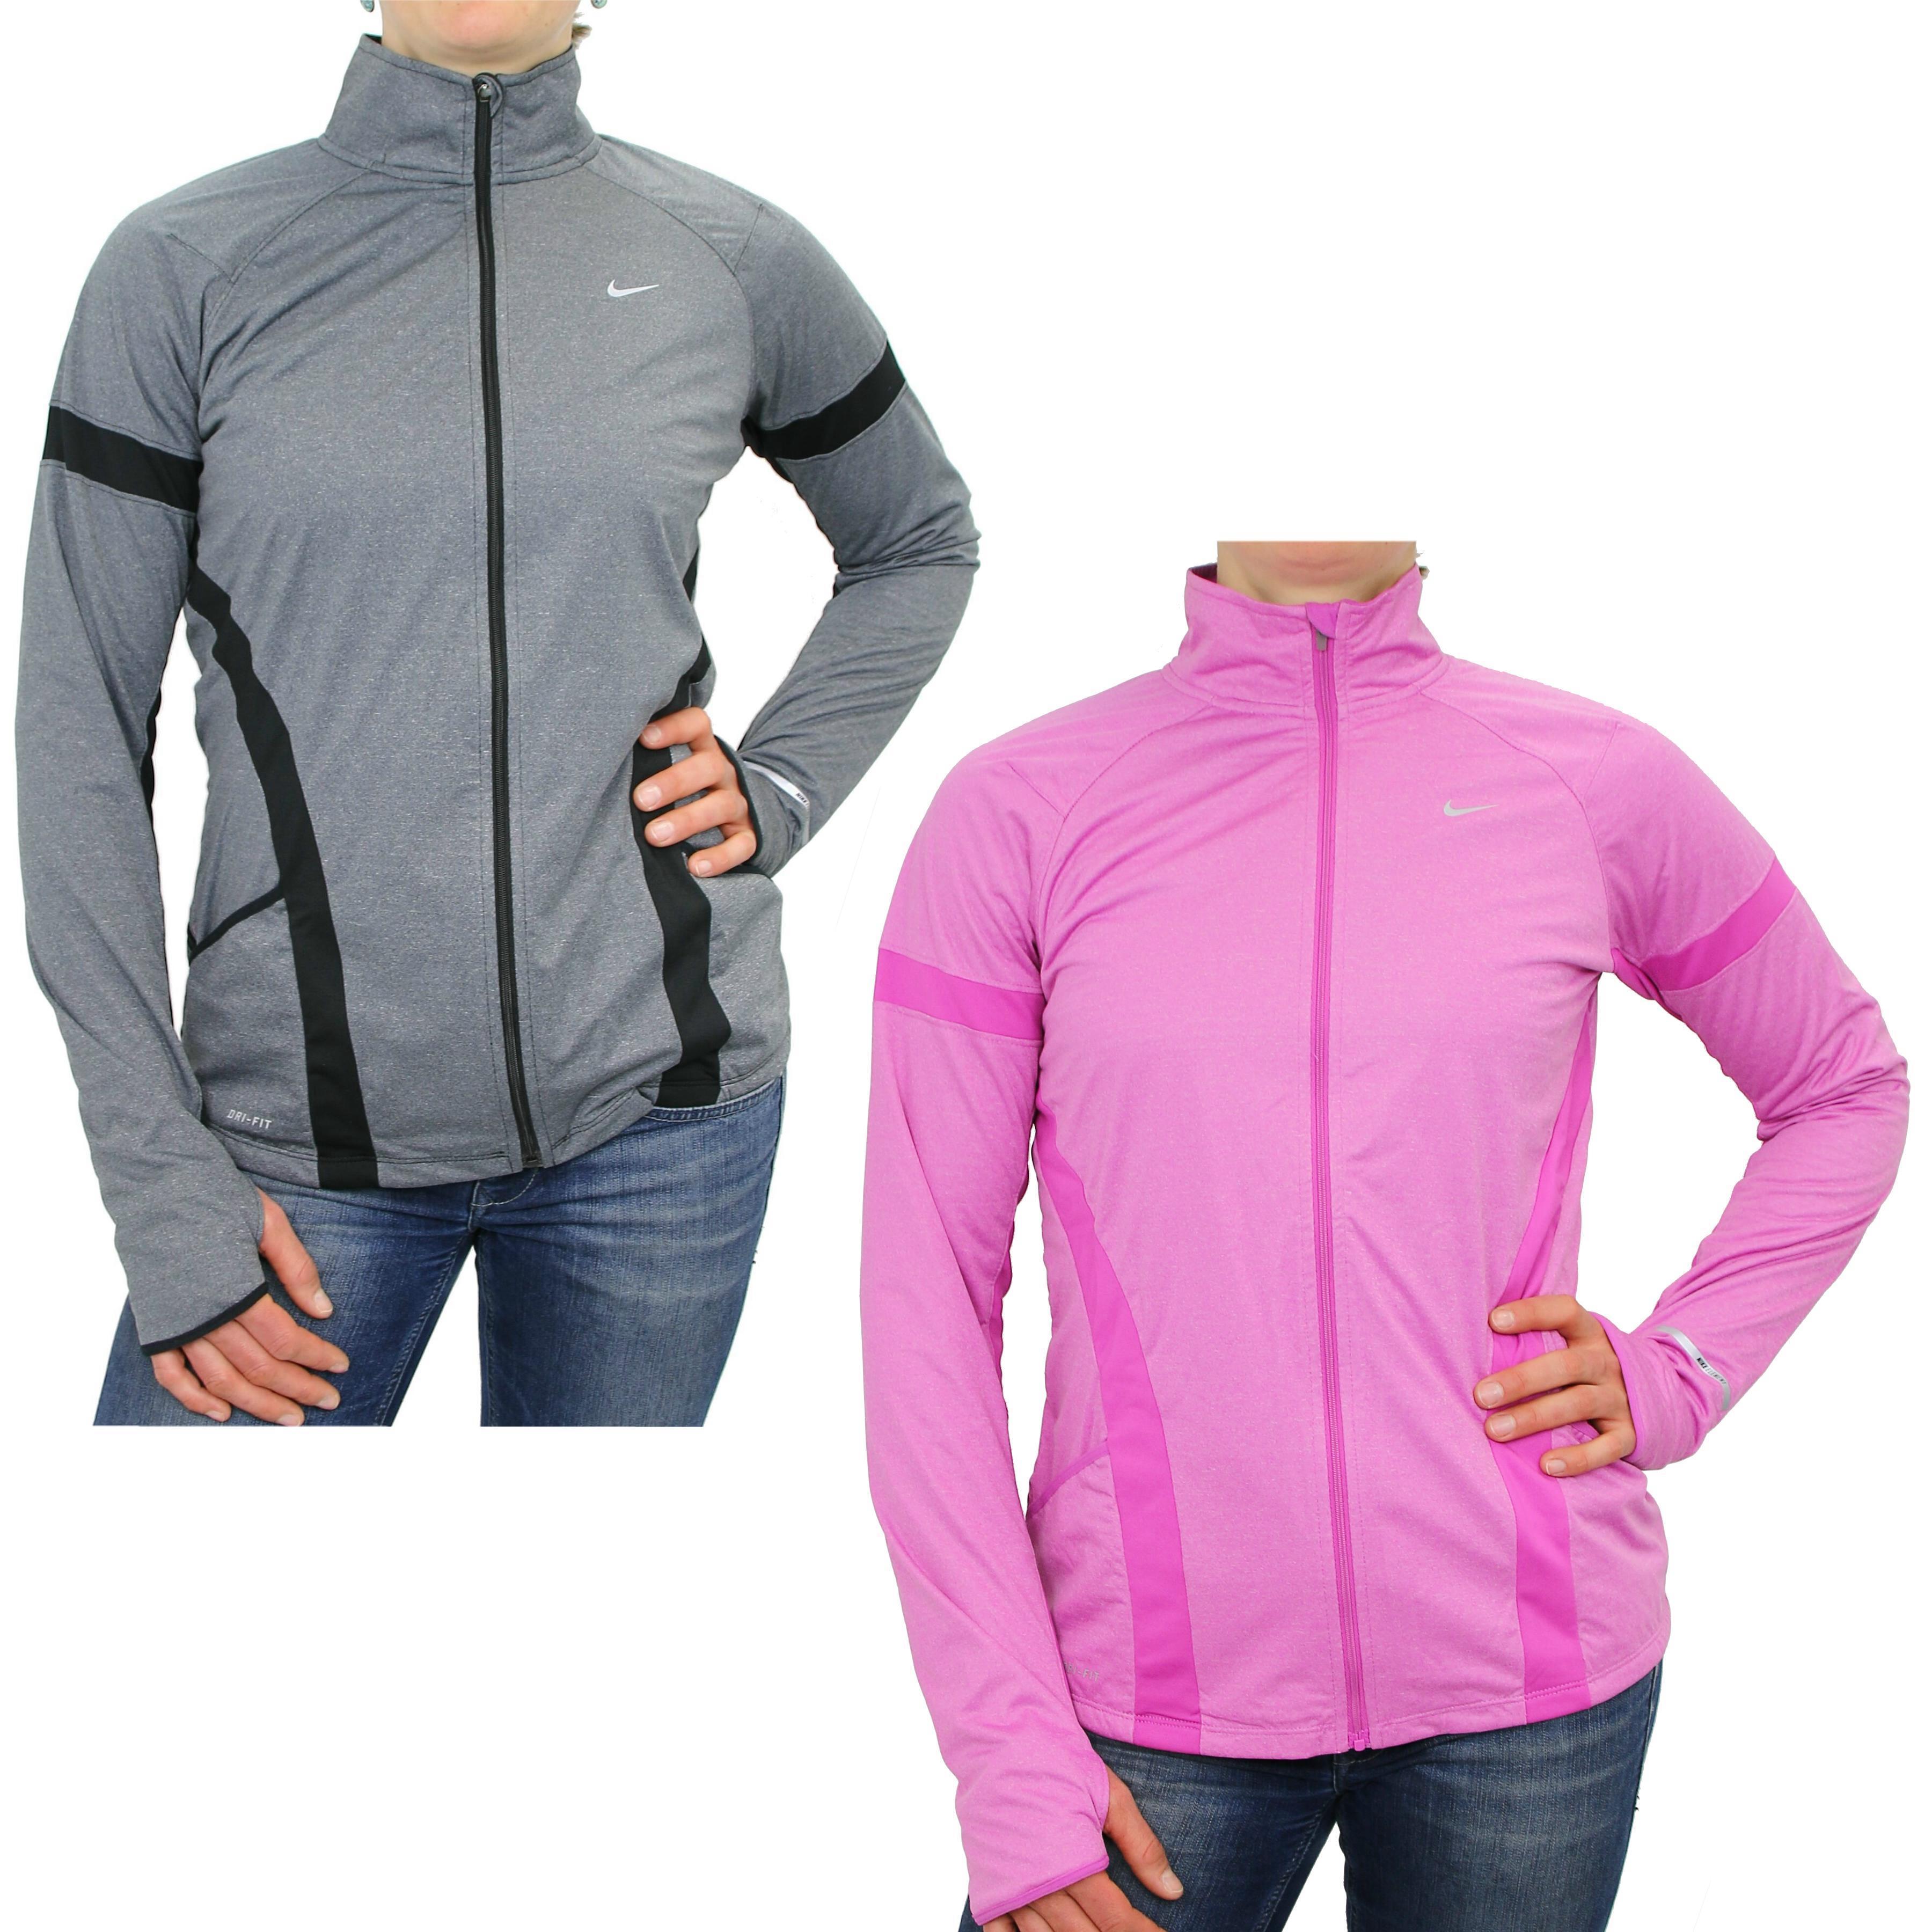 nike element shield jacket schwarz pink damen jacke sportjacke fitnessjacke ebay. Black Bedroom Furniture Sets. Home Design Ideas